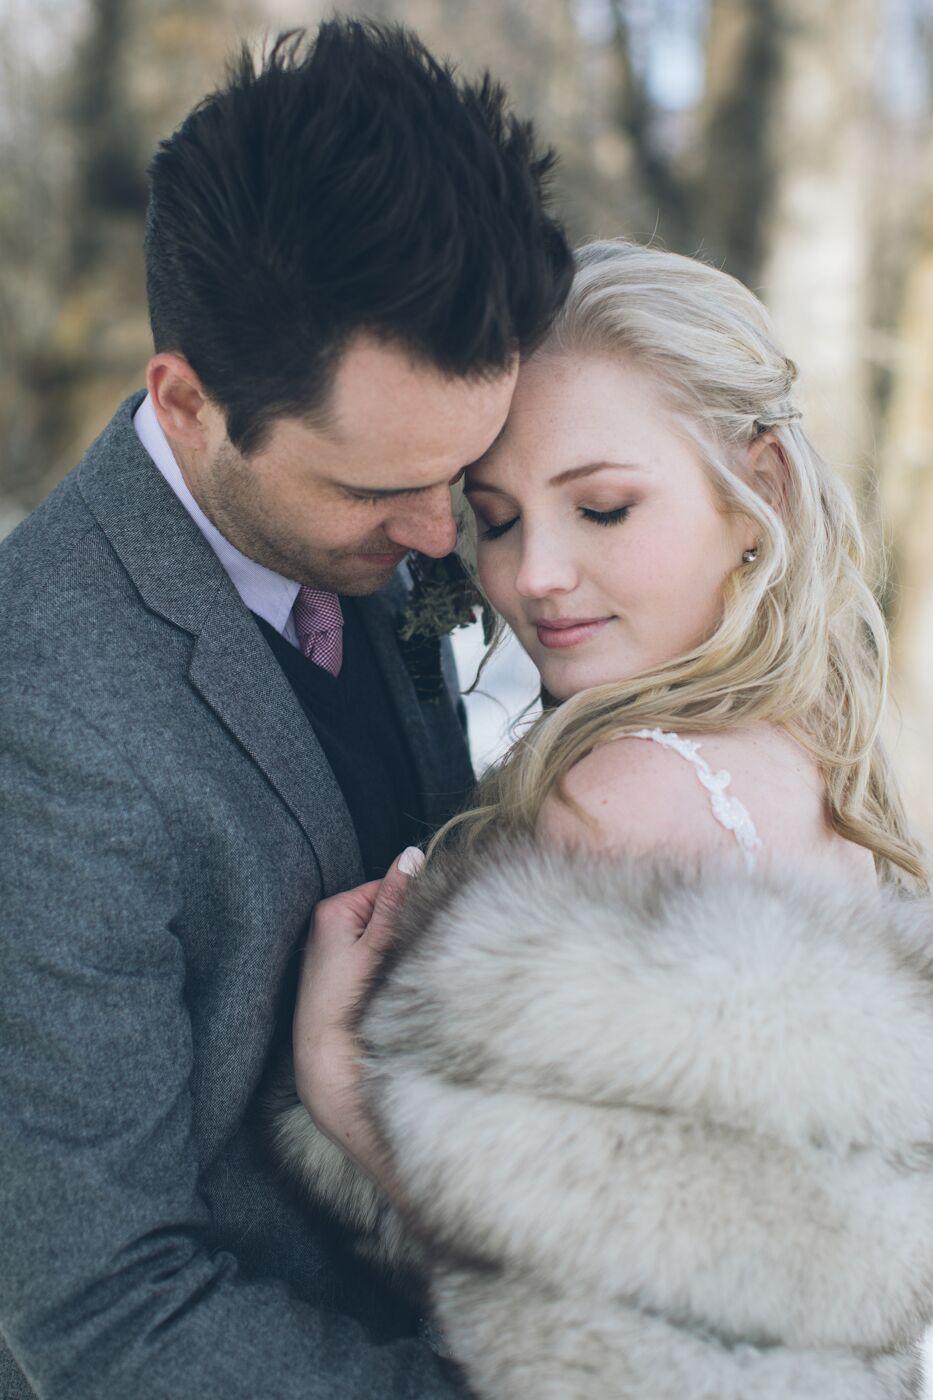 aniko-photography-mt-hood-bnb-wedding-66_preview.jpeg